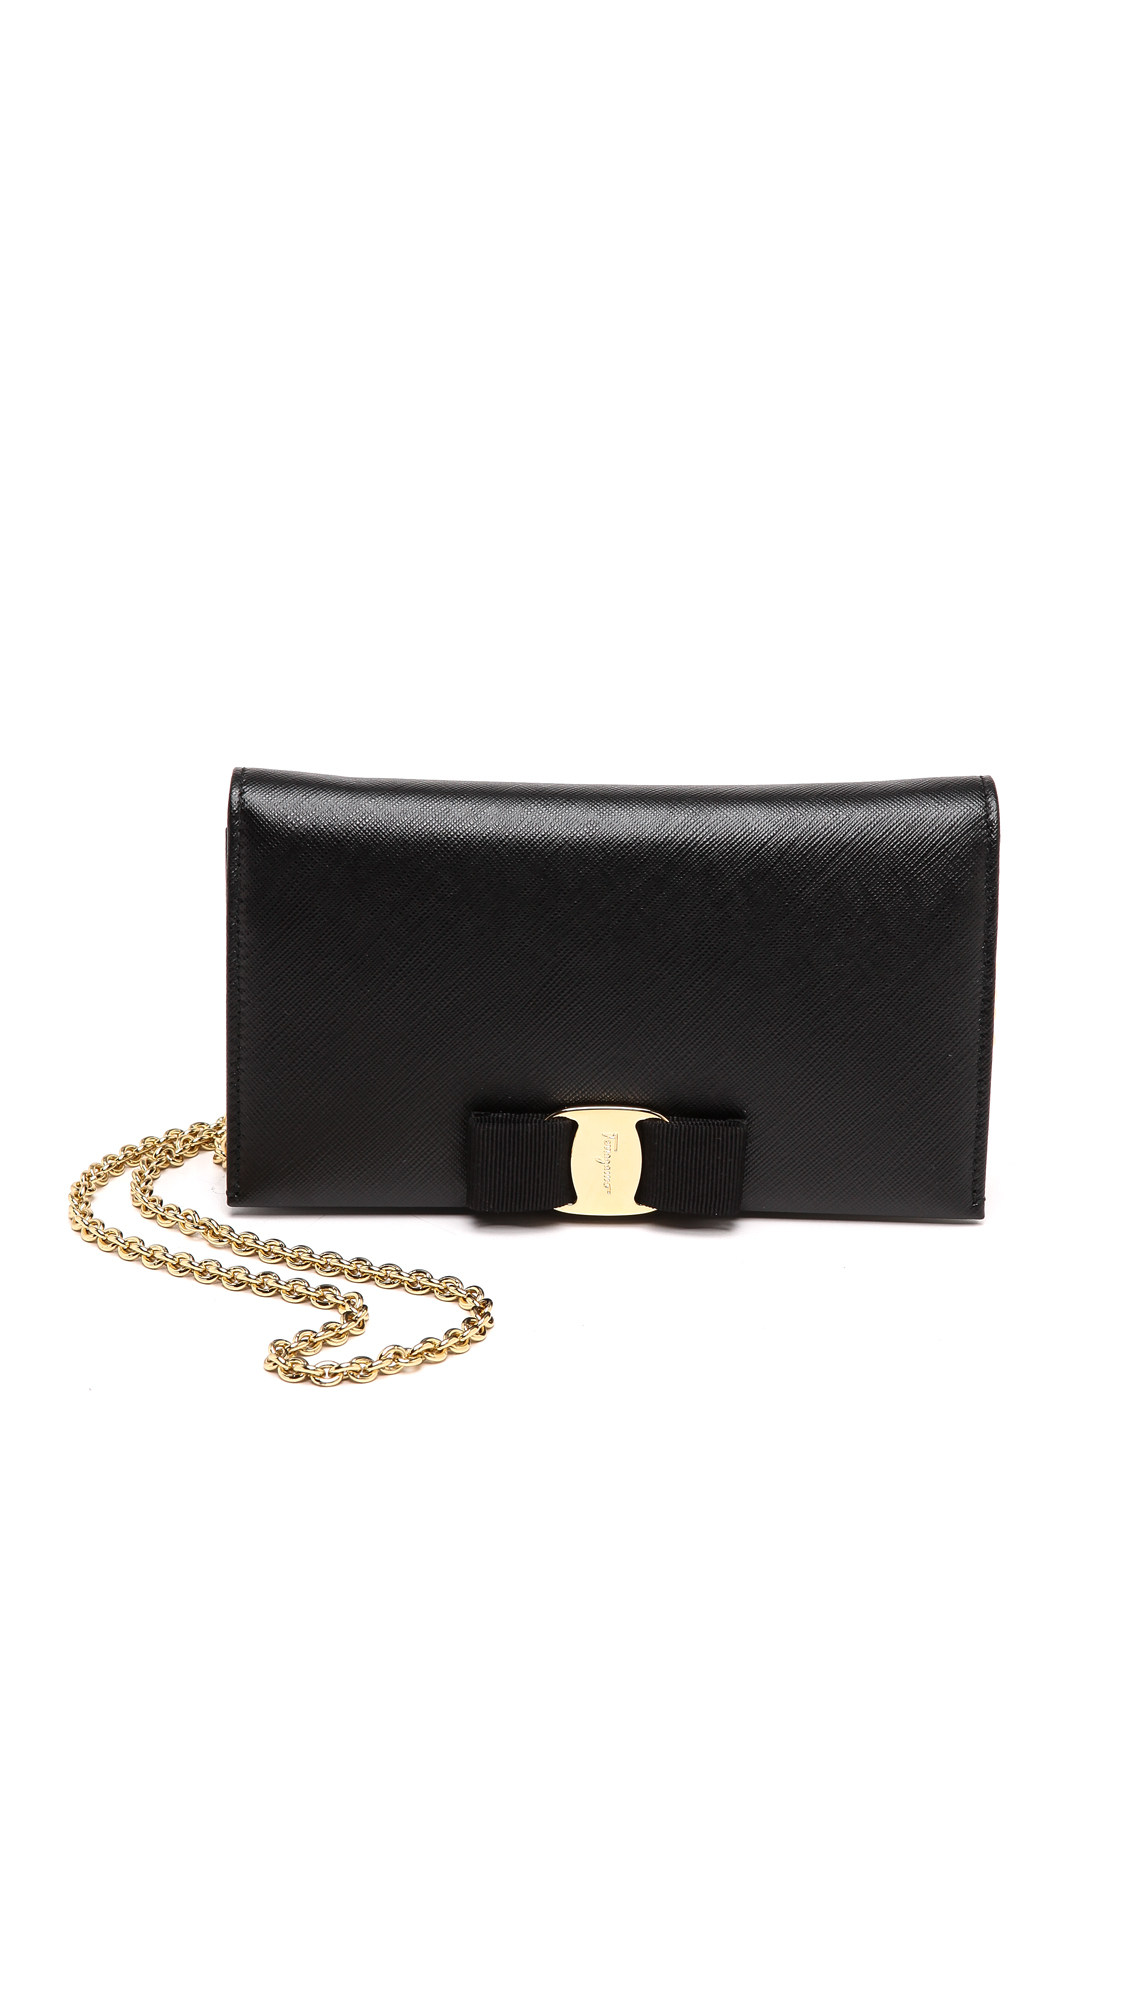 45f9253f2542 Ferragamo Miss Vara Wallet On A Chain Nero in Black (Nero) | Lyst